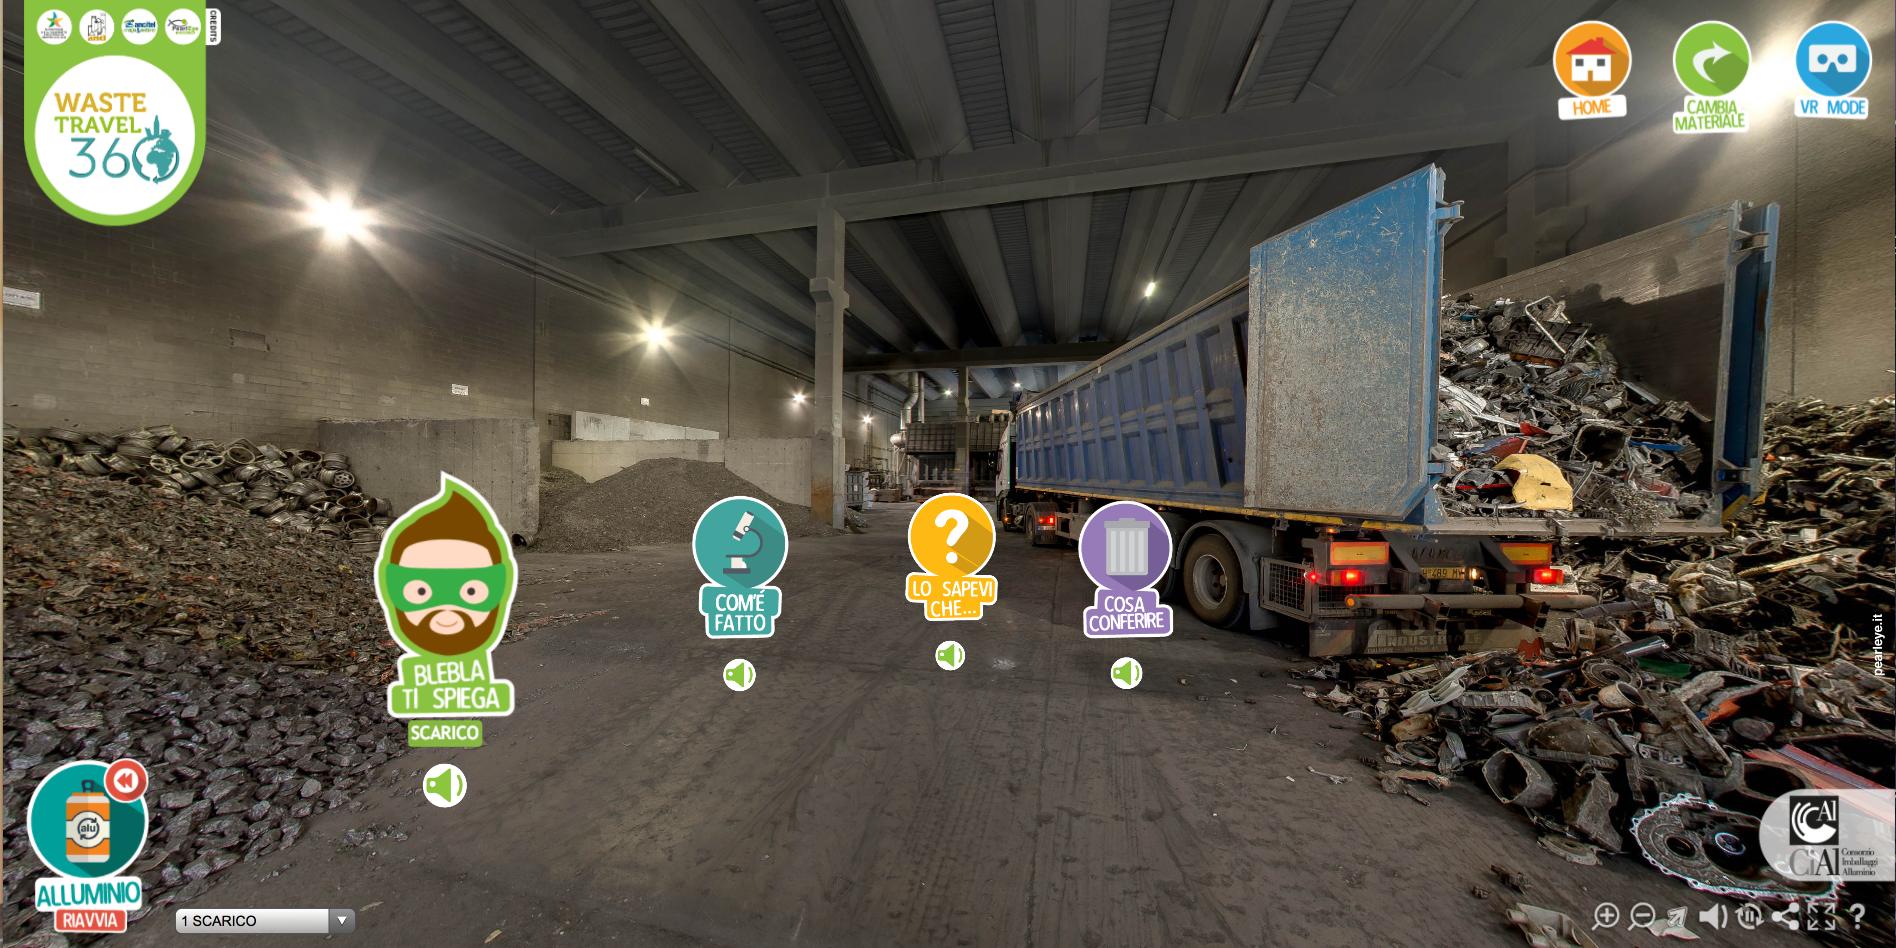 waste-trave-realta-virtuale-rifiuti.png